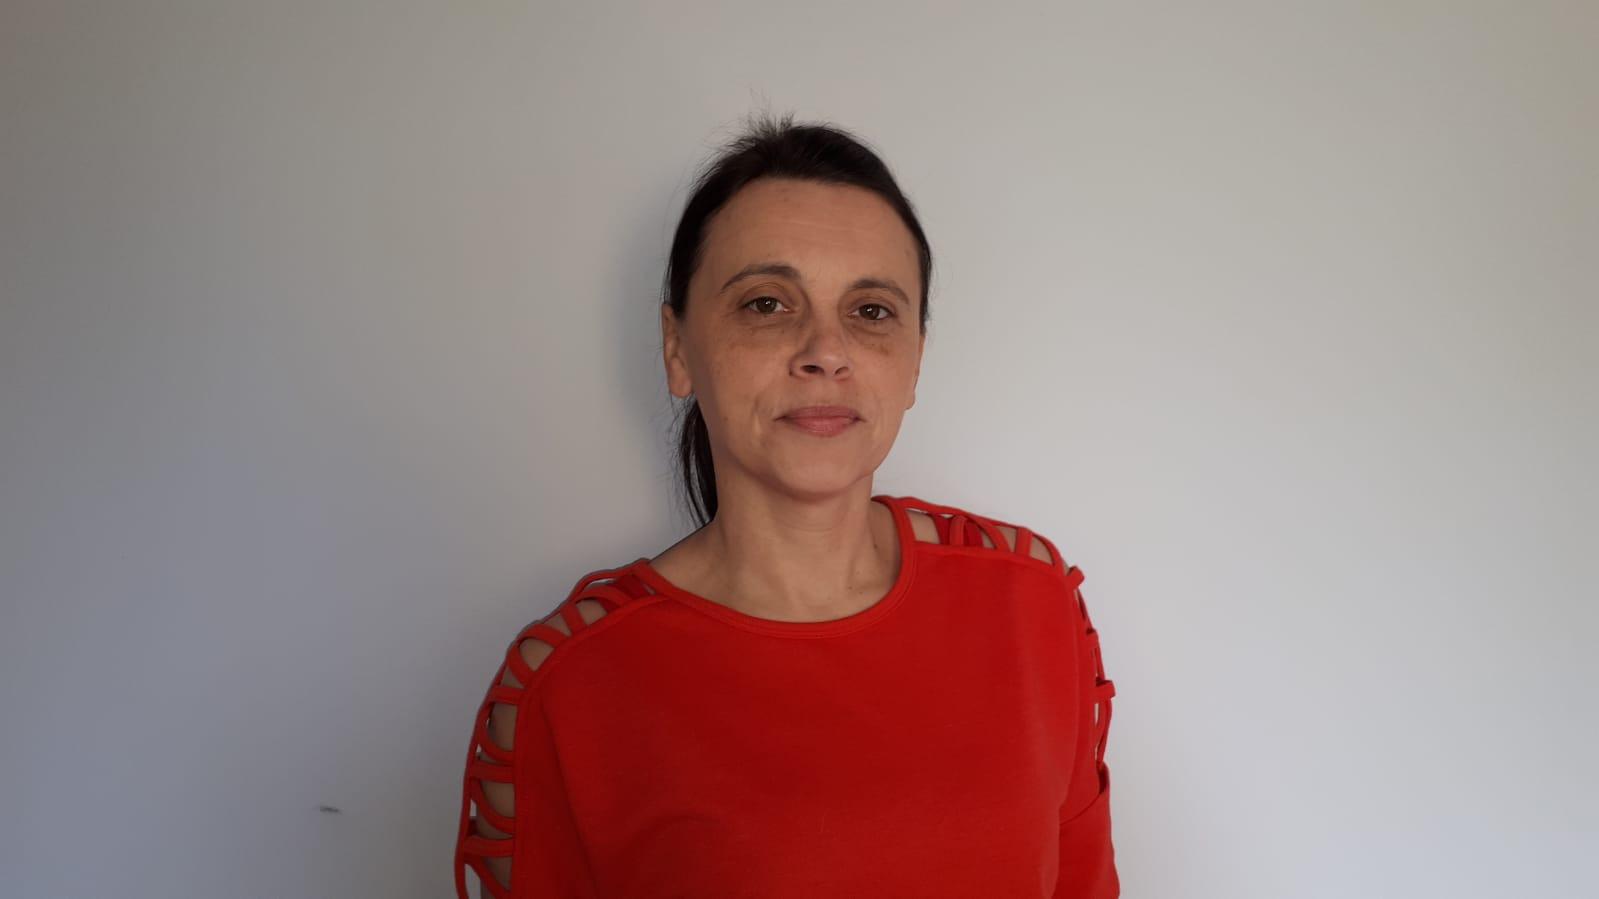 Agnieszka Rokosz